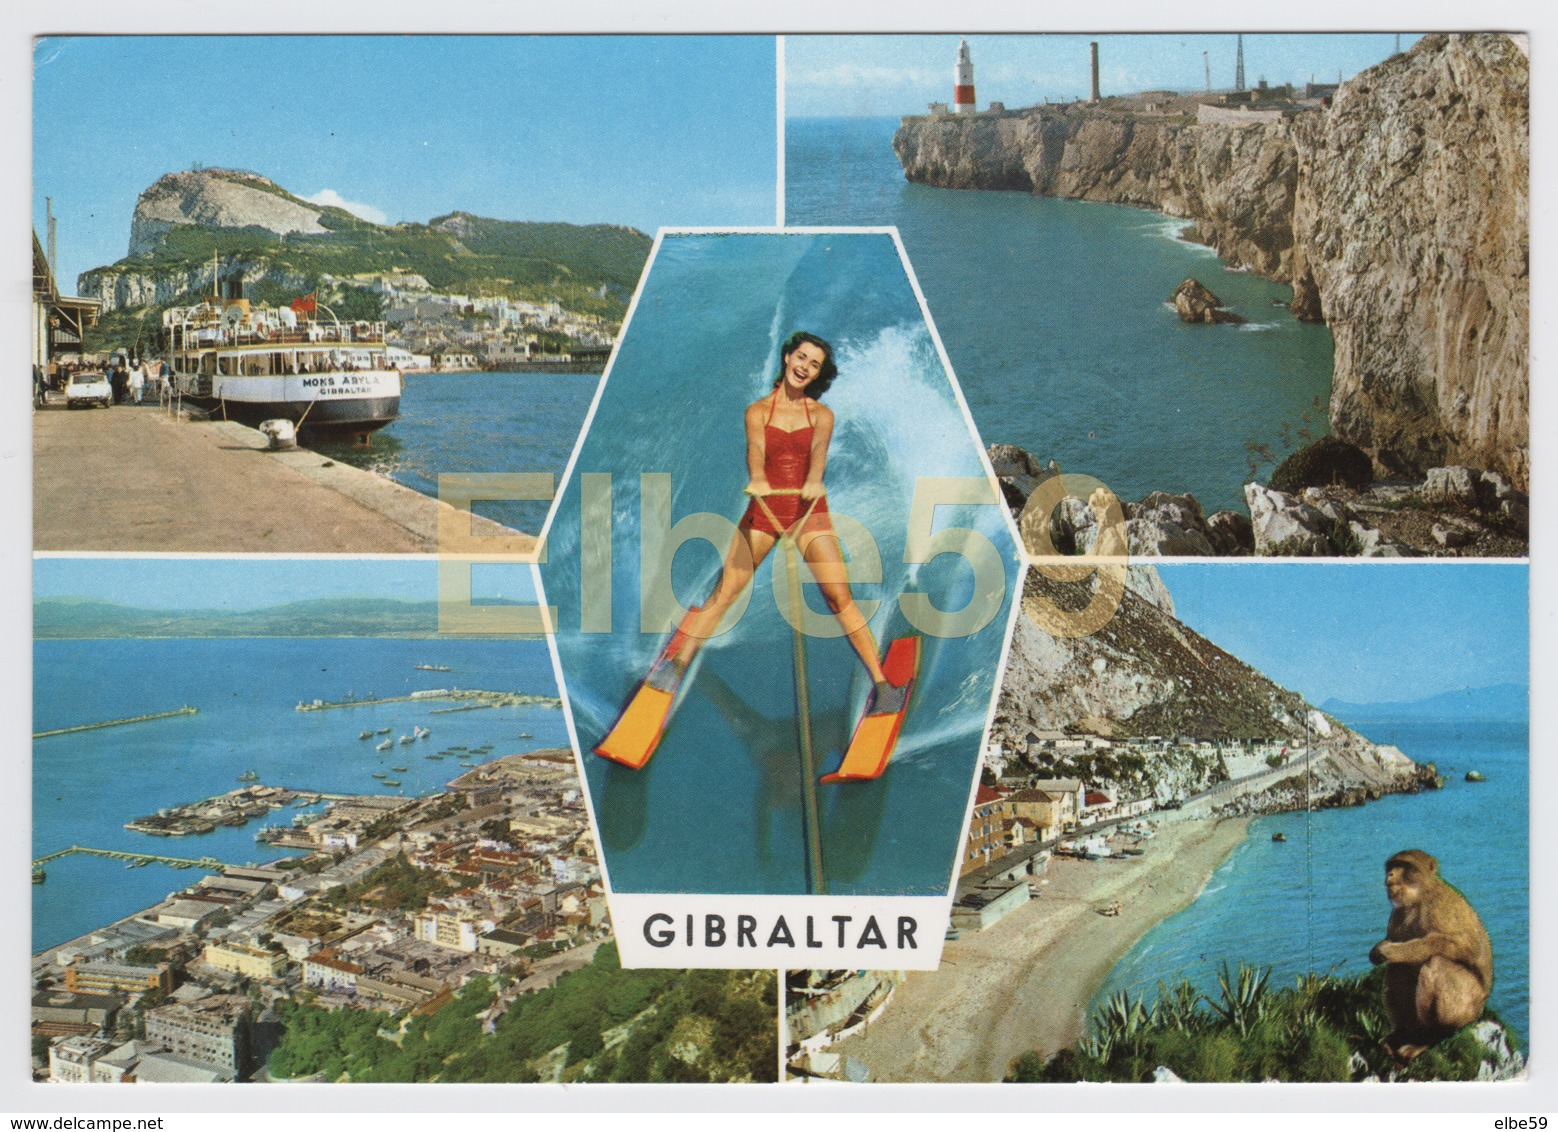 Gibraltar, Multivuew Card, Landscape, Water Ski, Monkey, Used - Gibraltar